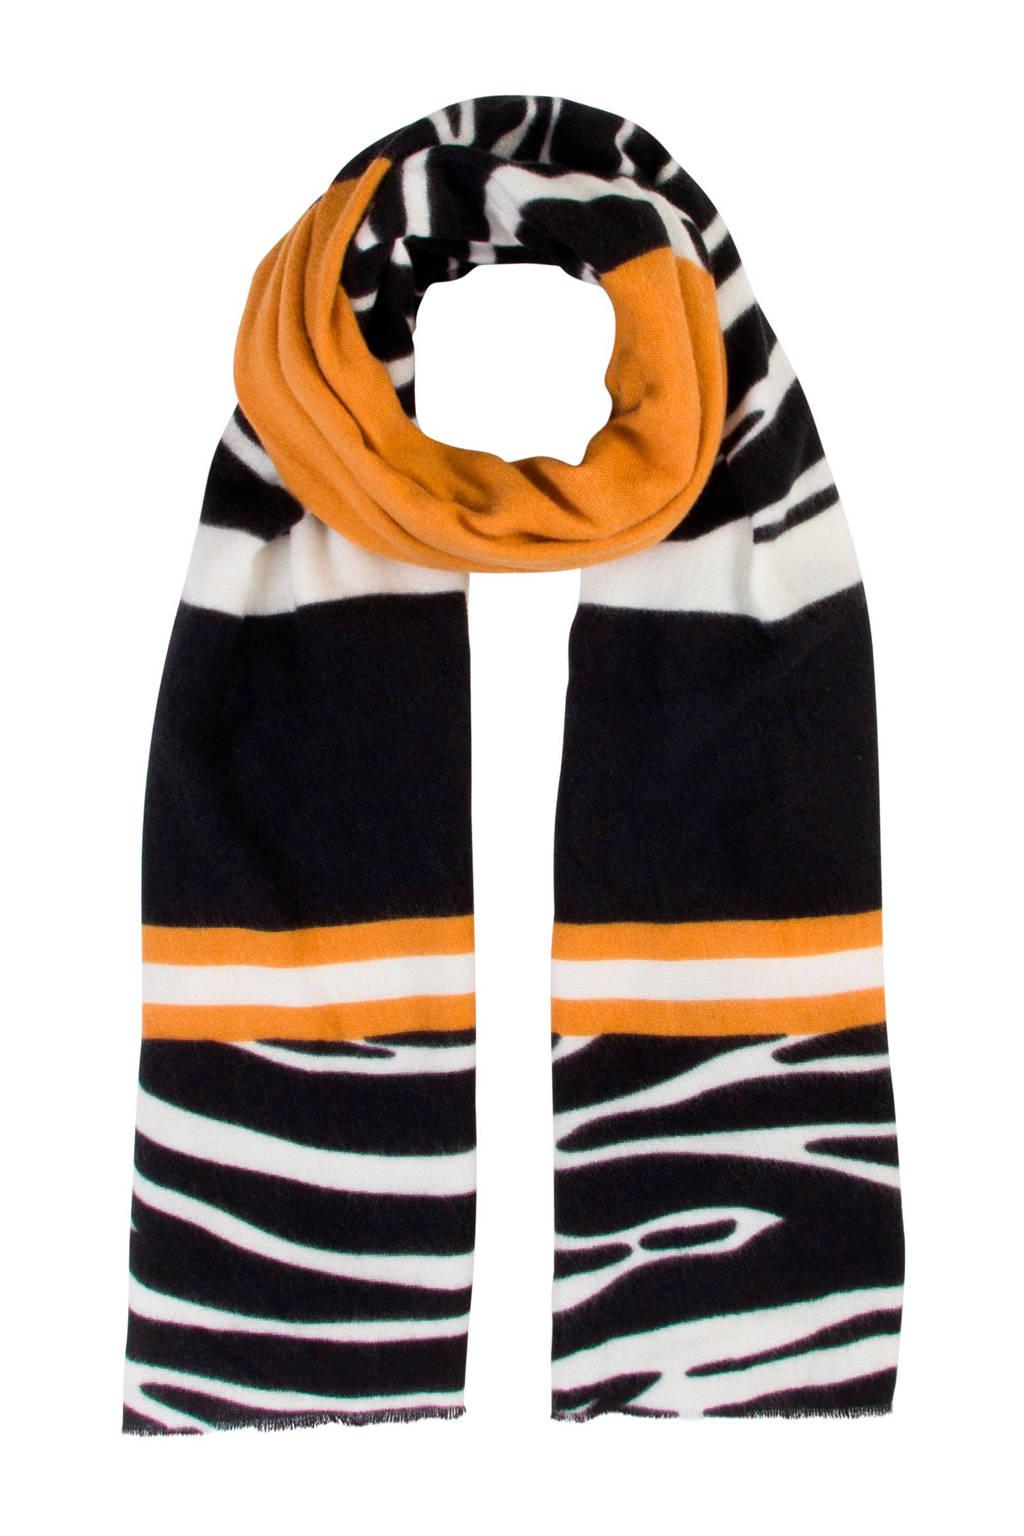 Miss Etam Accessoires gestreepte sjaal oranje, Oranje/zwart/wit